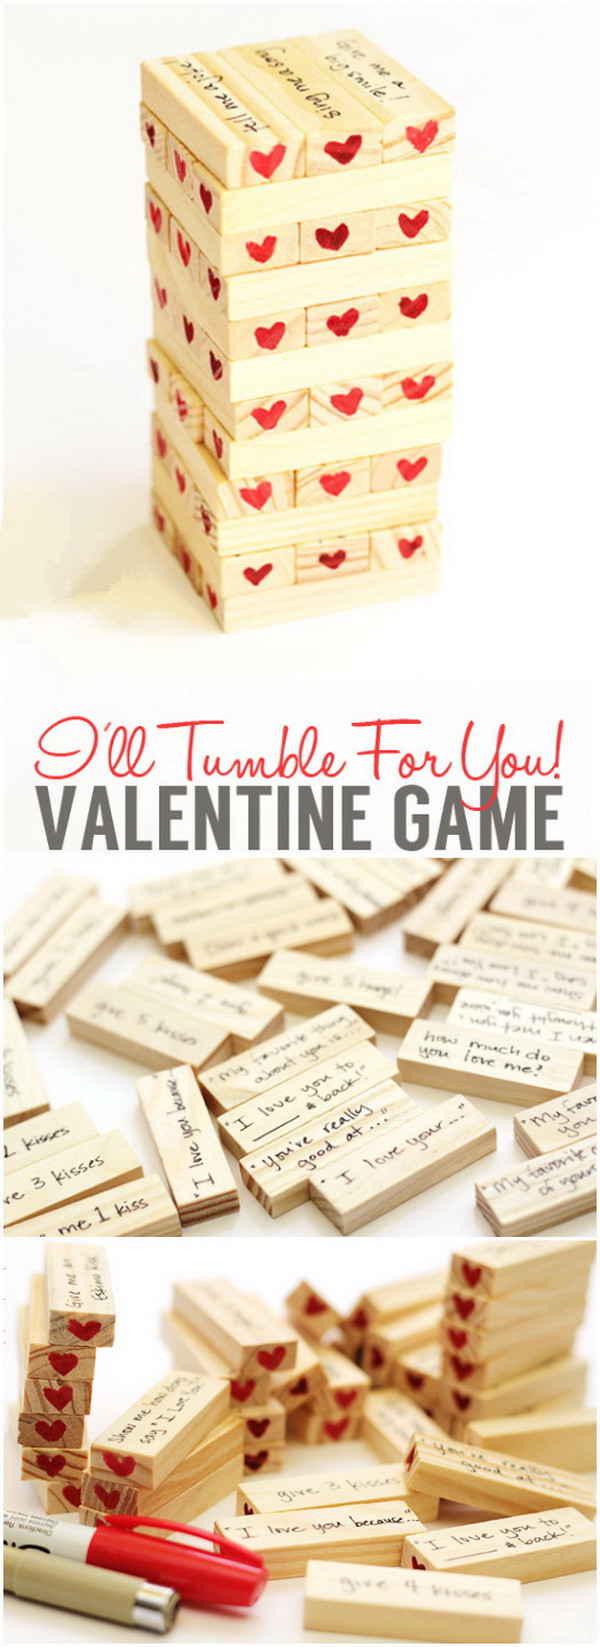 Valentine Gift Ideas For Boyfriend  Easy DIY Valentine s Day Gifts for Boyfriend Listing More